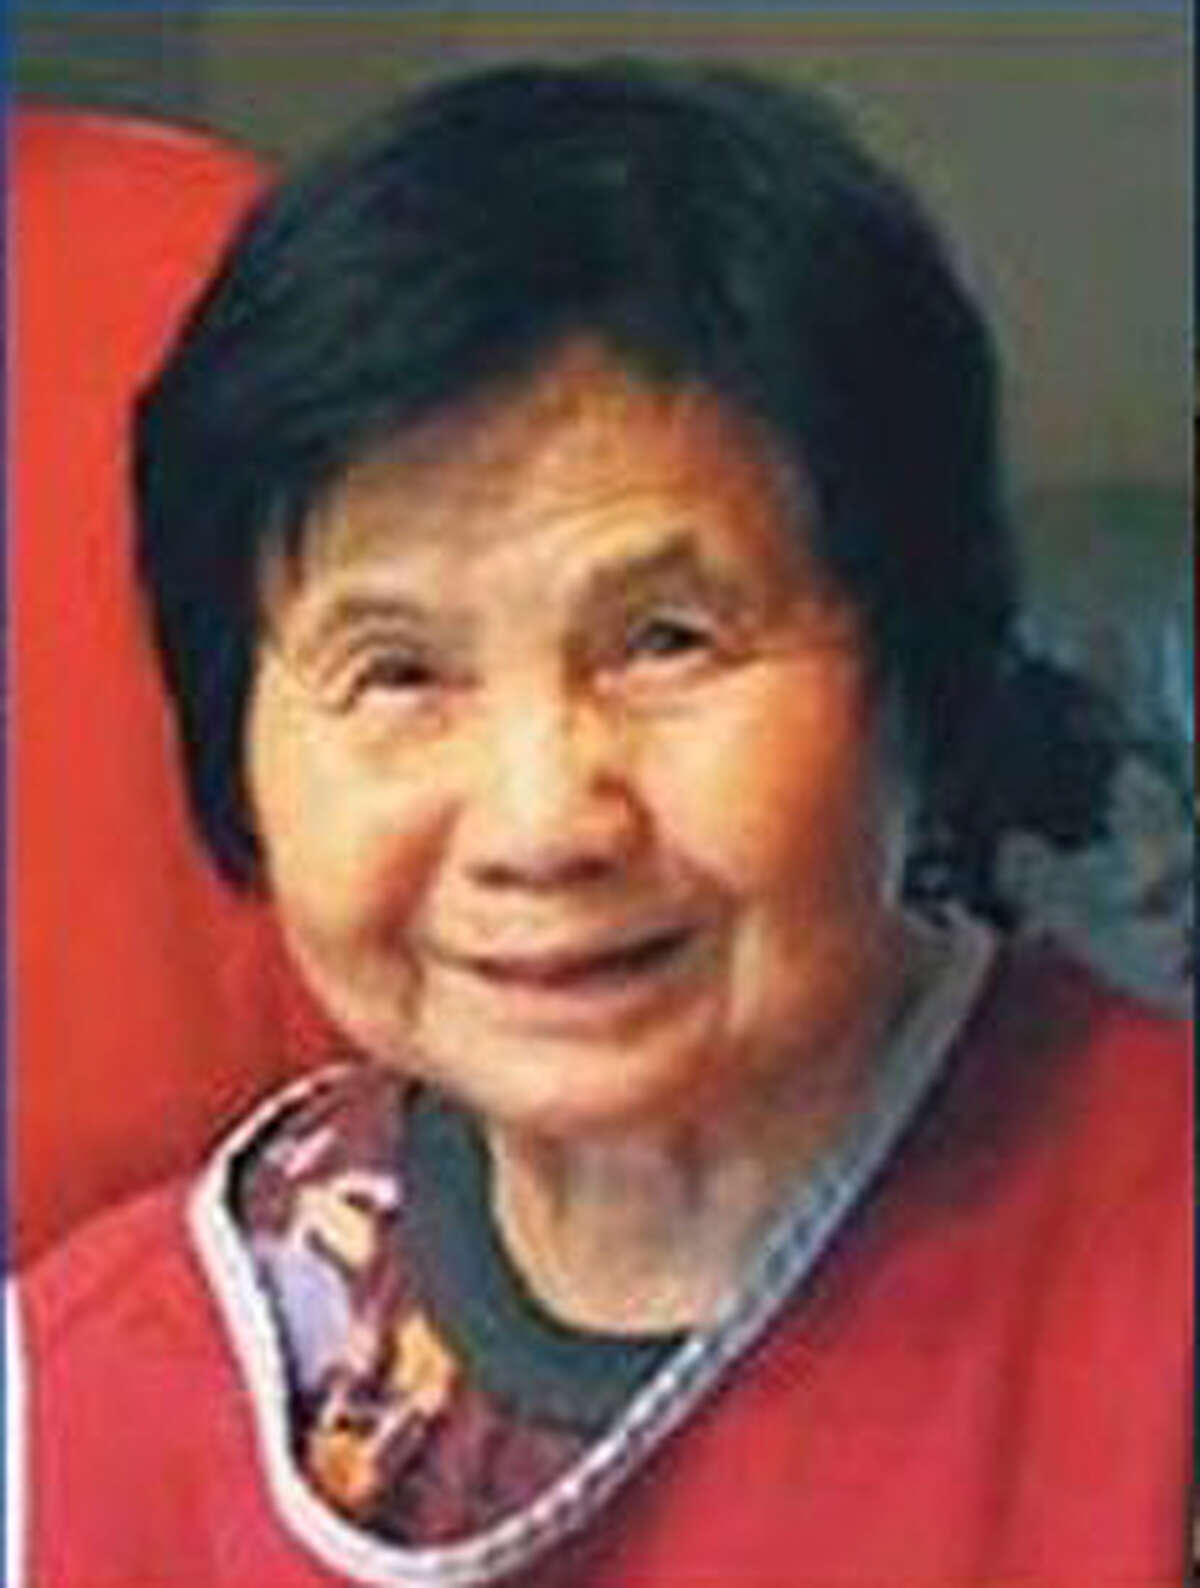 Su-Jung Teng, 79, was attacked while gardening in her Sharpstown backyard.